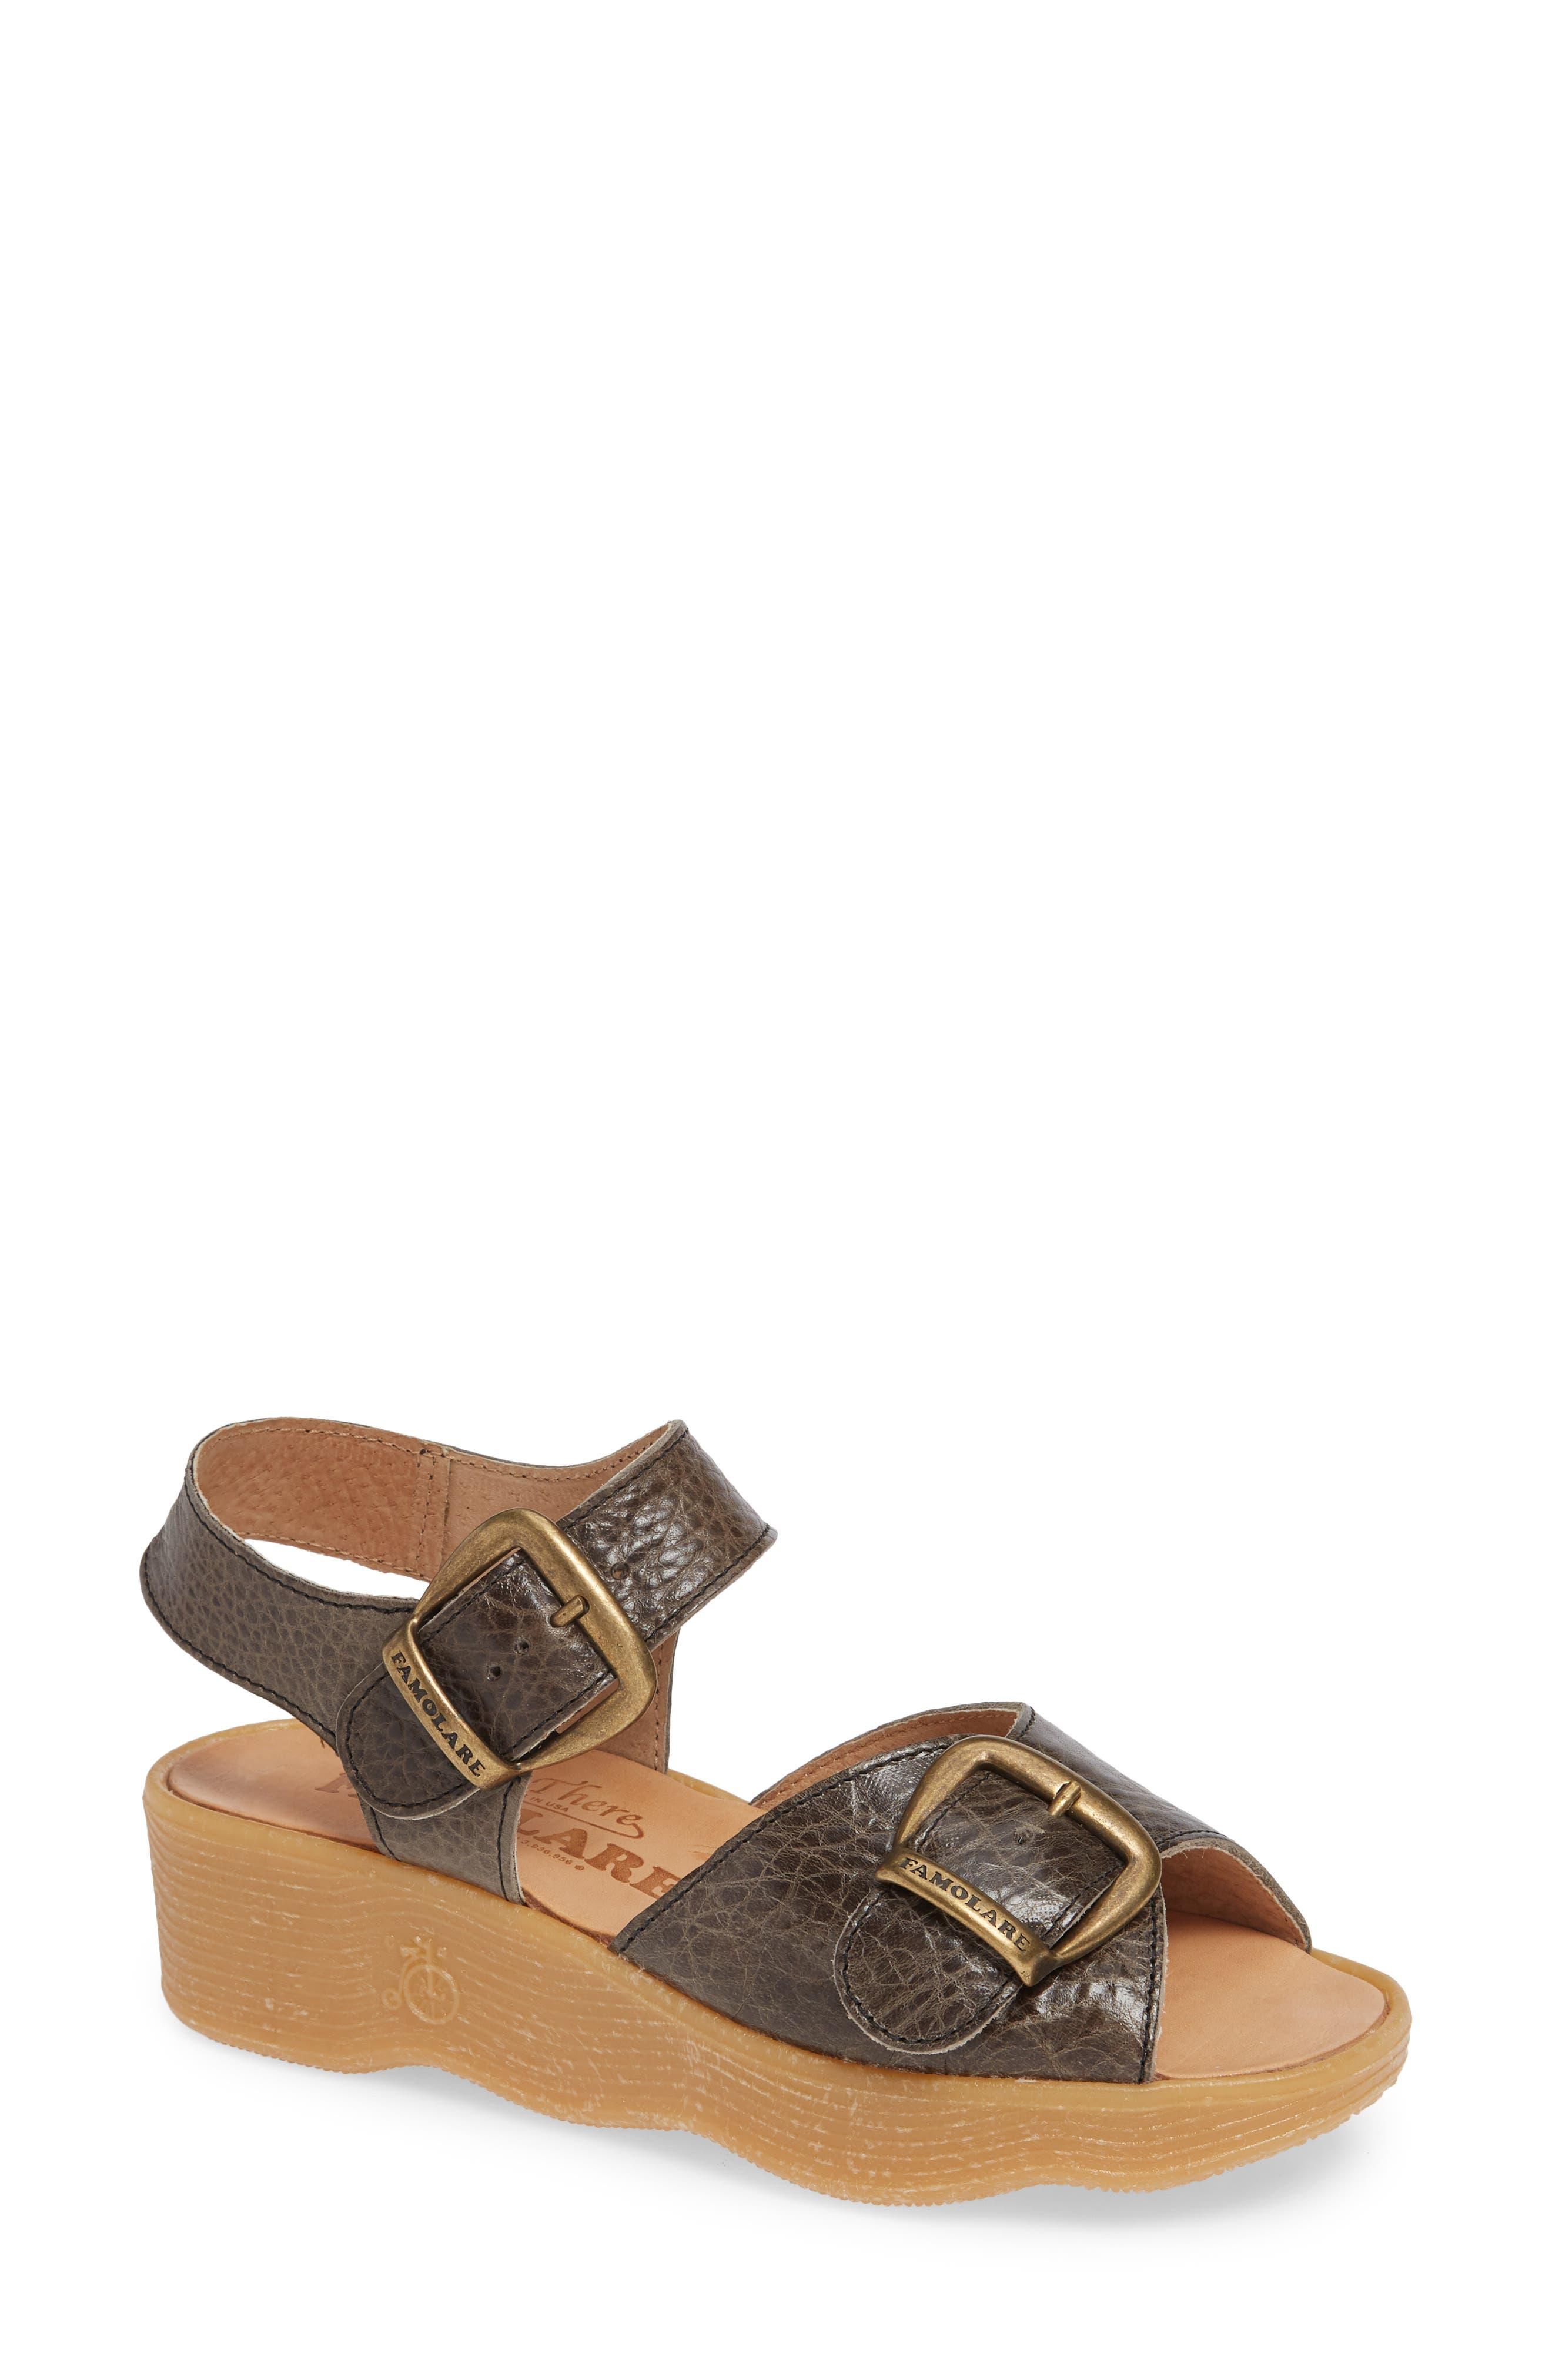 Double Play Platform Sandal,                         Main,                         color, STEEL SUEDE